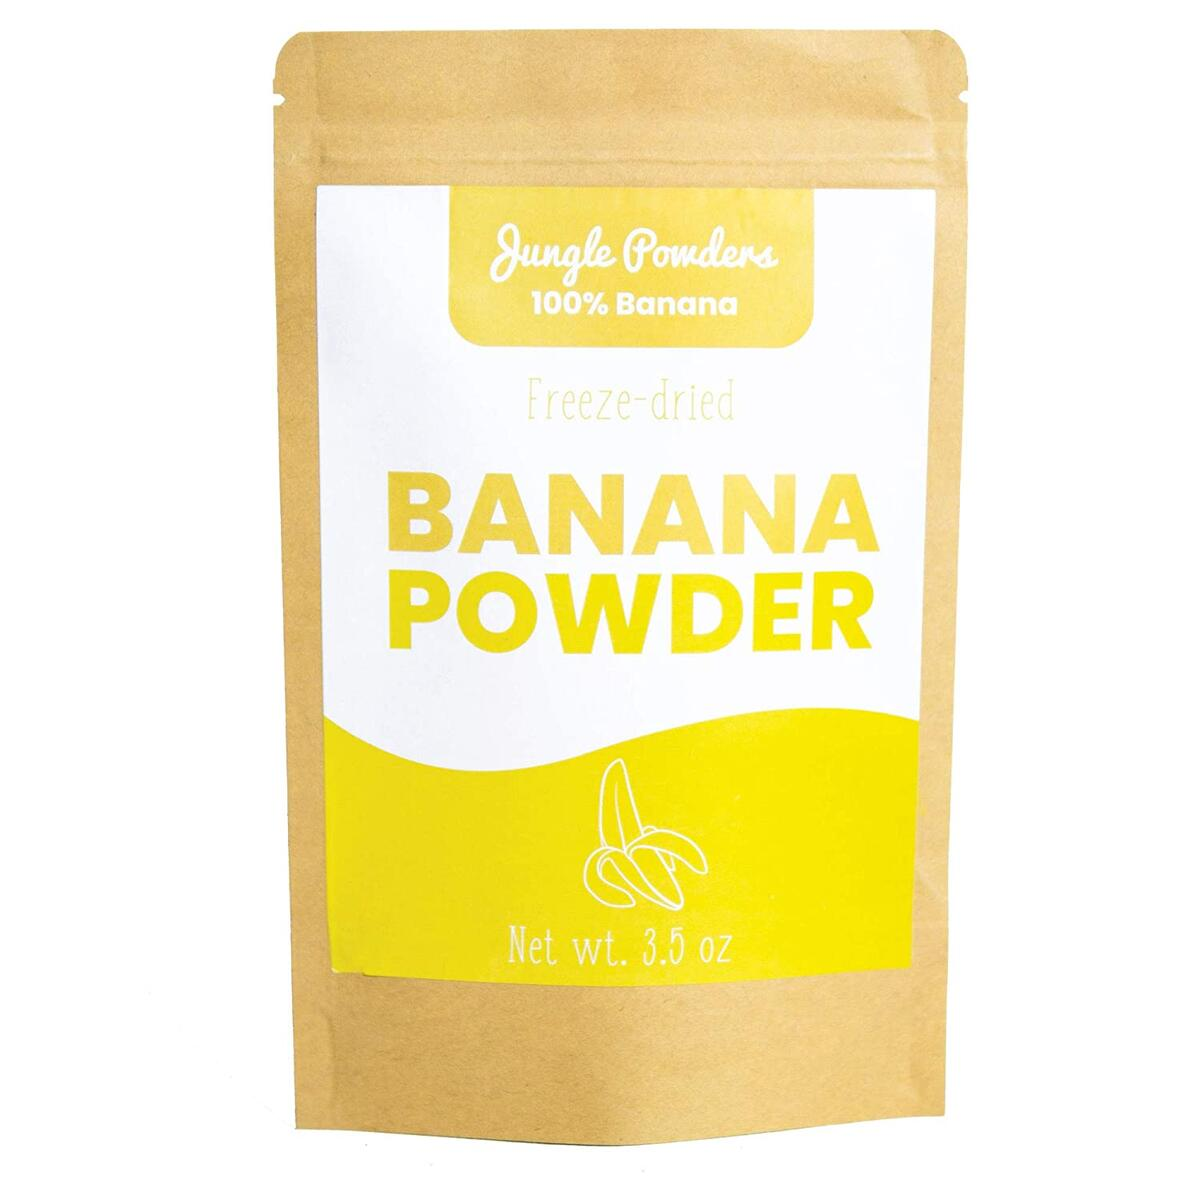 Jungle Powders Banana Powder | 3.5oz 100% Natural Freeze Dried Banana Powder | Whole Food Powder Freeze-Dried Fruit | Gluten Free No Sugar Added Non GMO